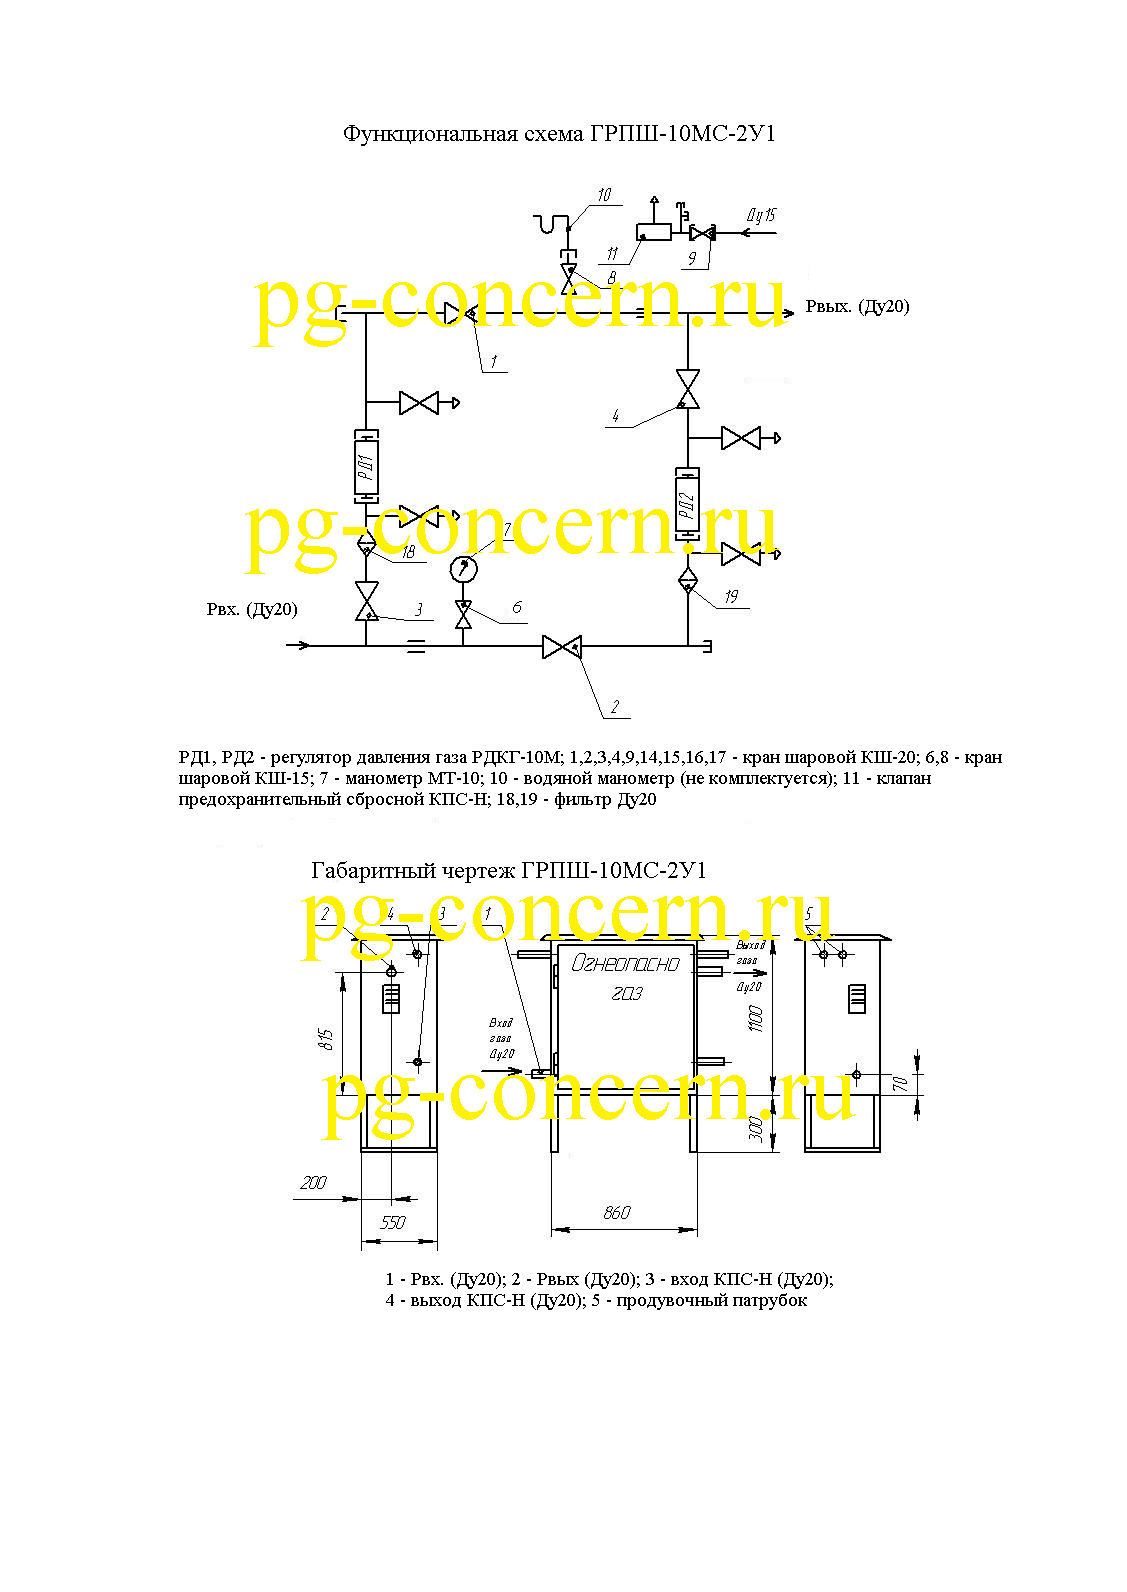 грпш 1-1н технические характеристики